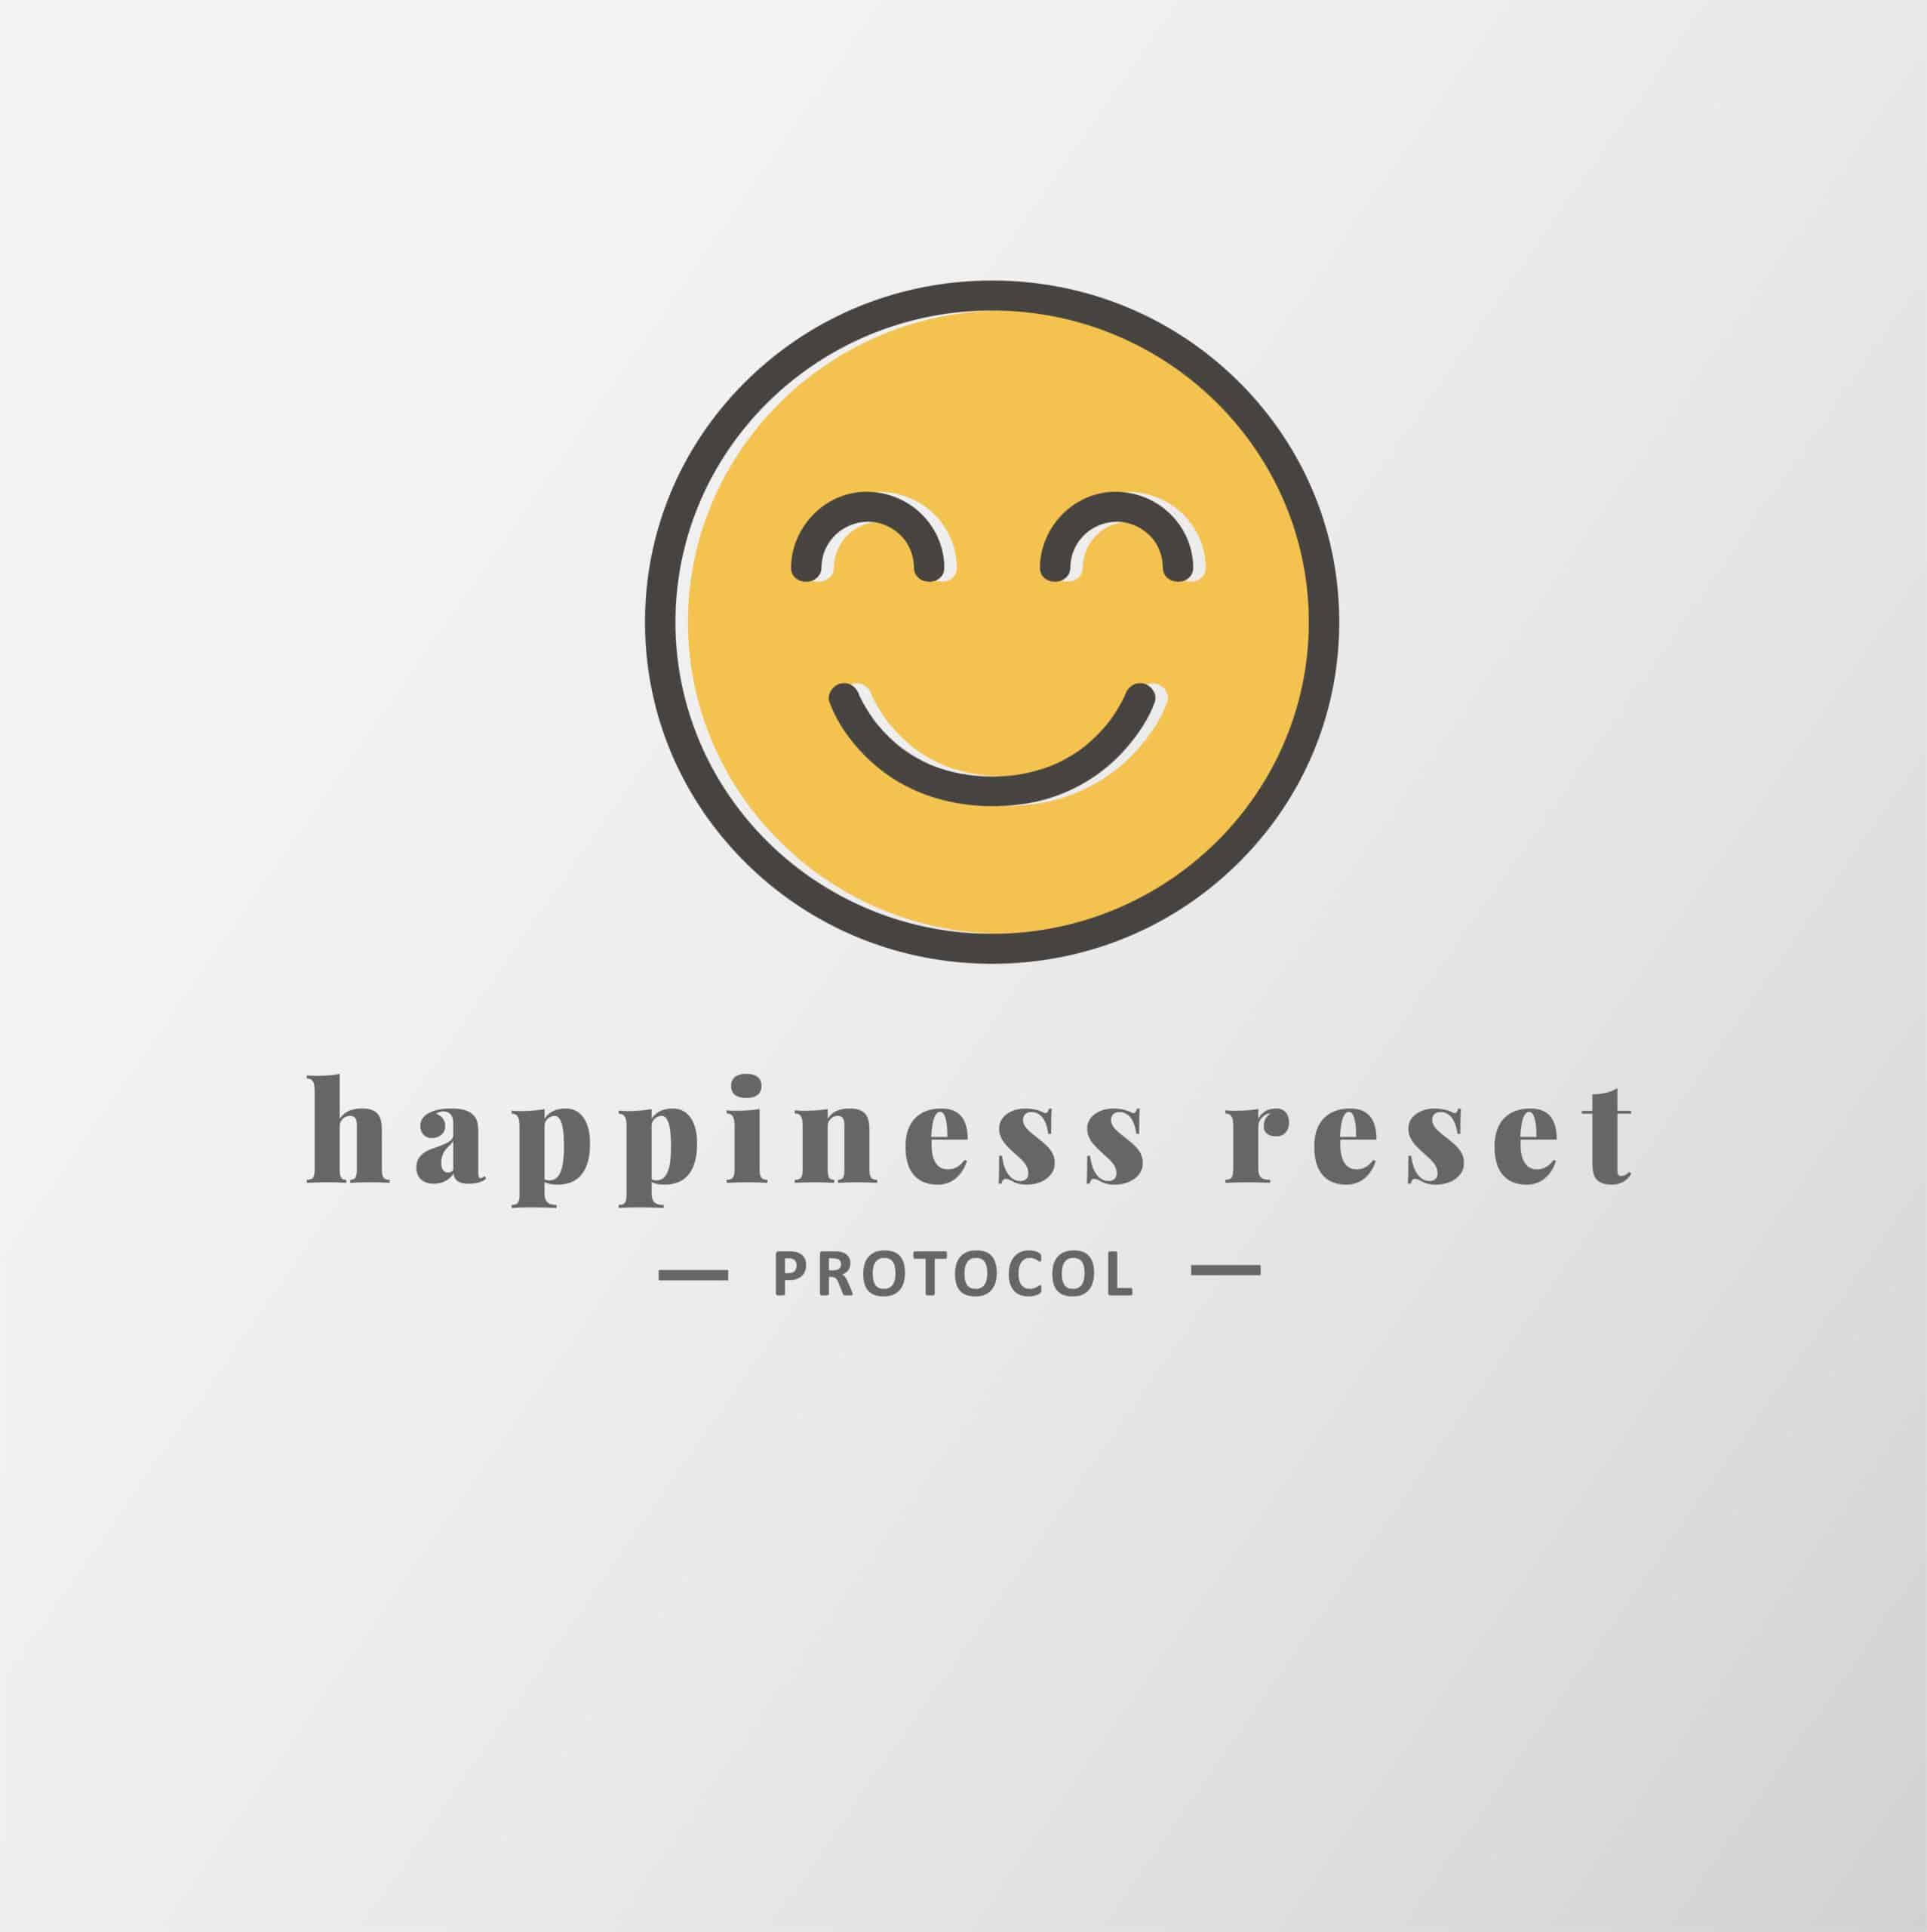 Happiness Reset Protocol